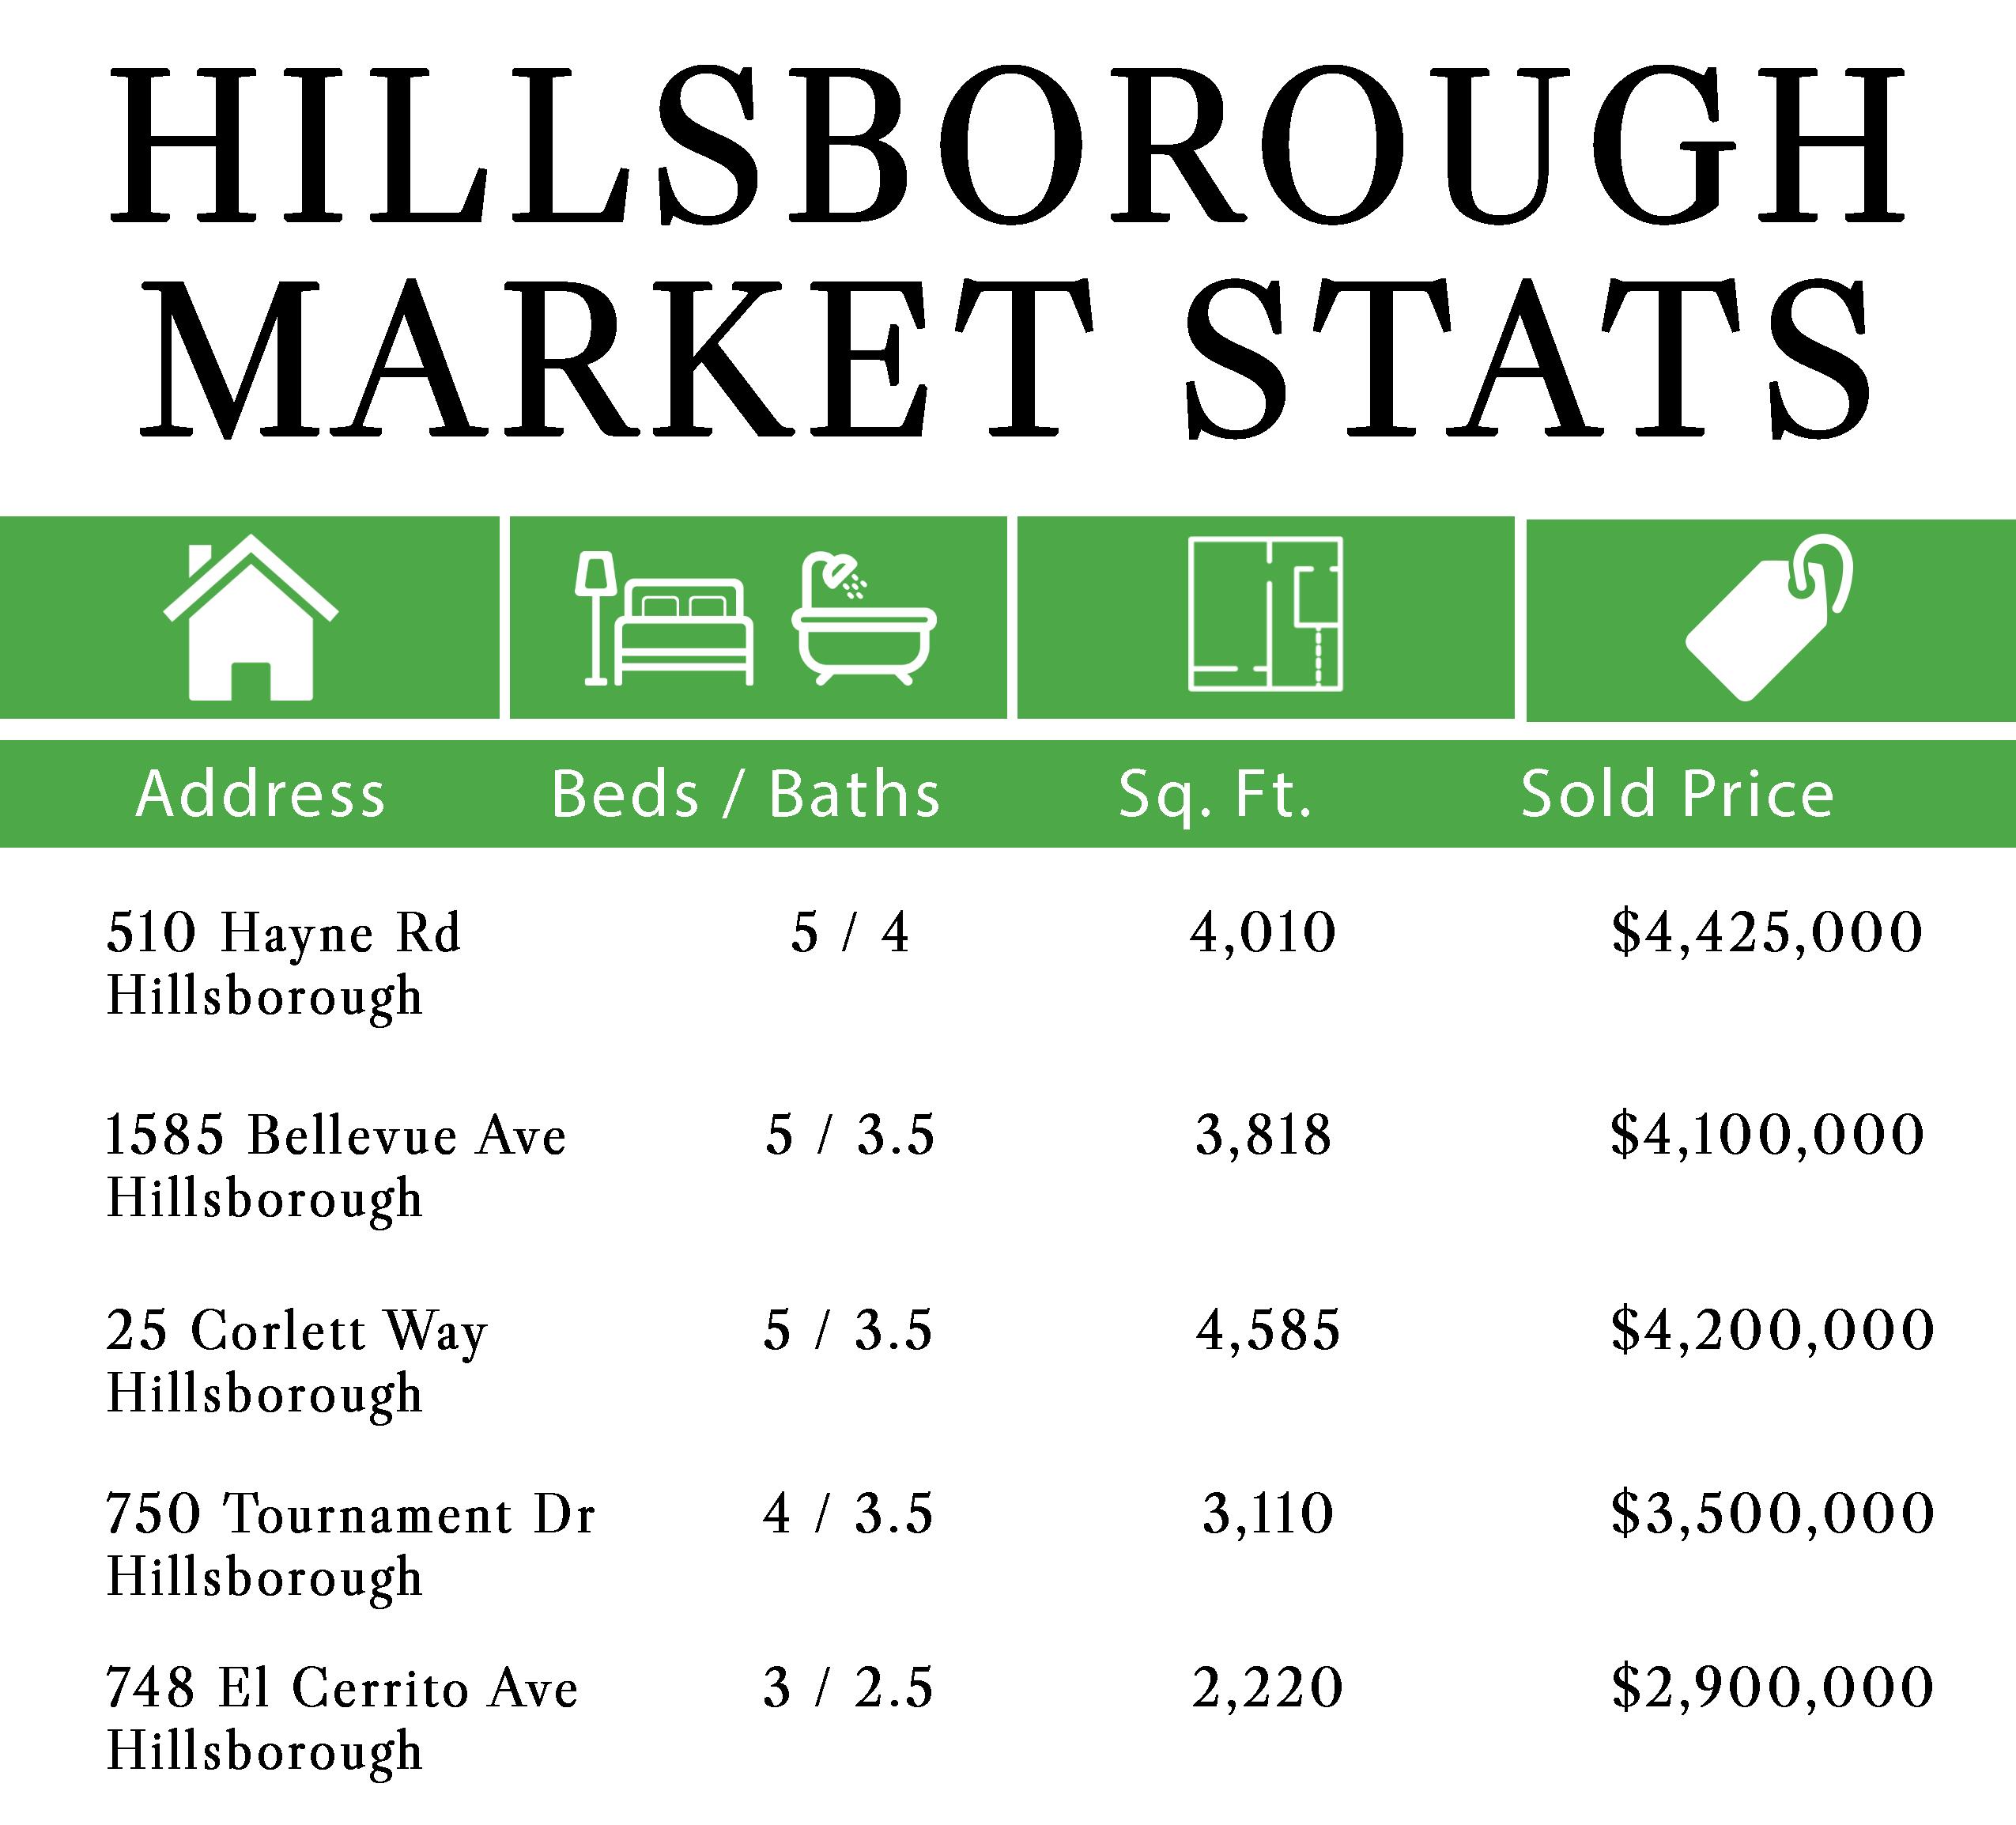 Market_Stats_Hillsborough_HOLIDAYS_Email_Blast.png